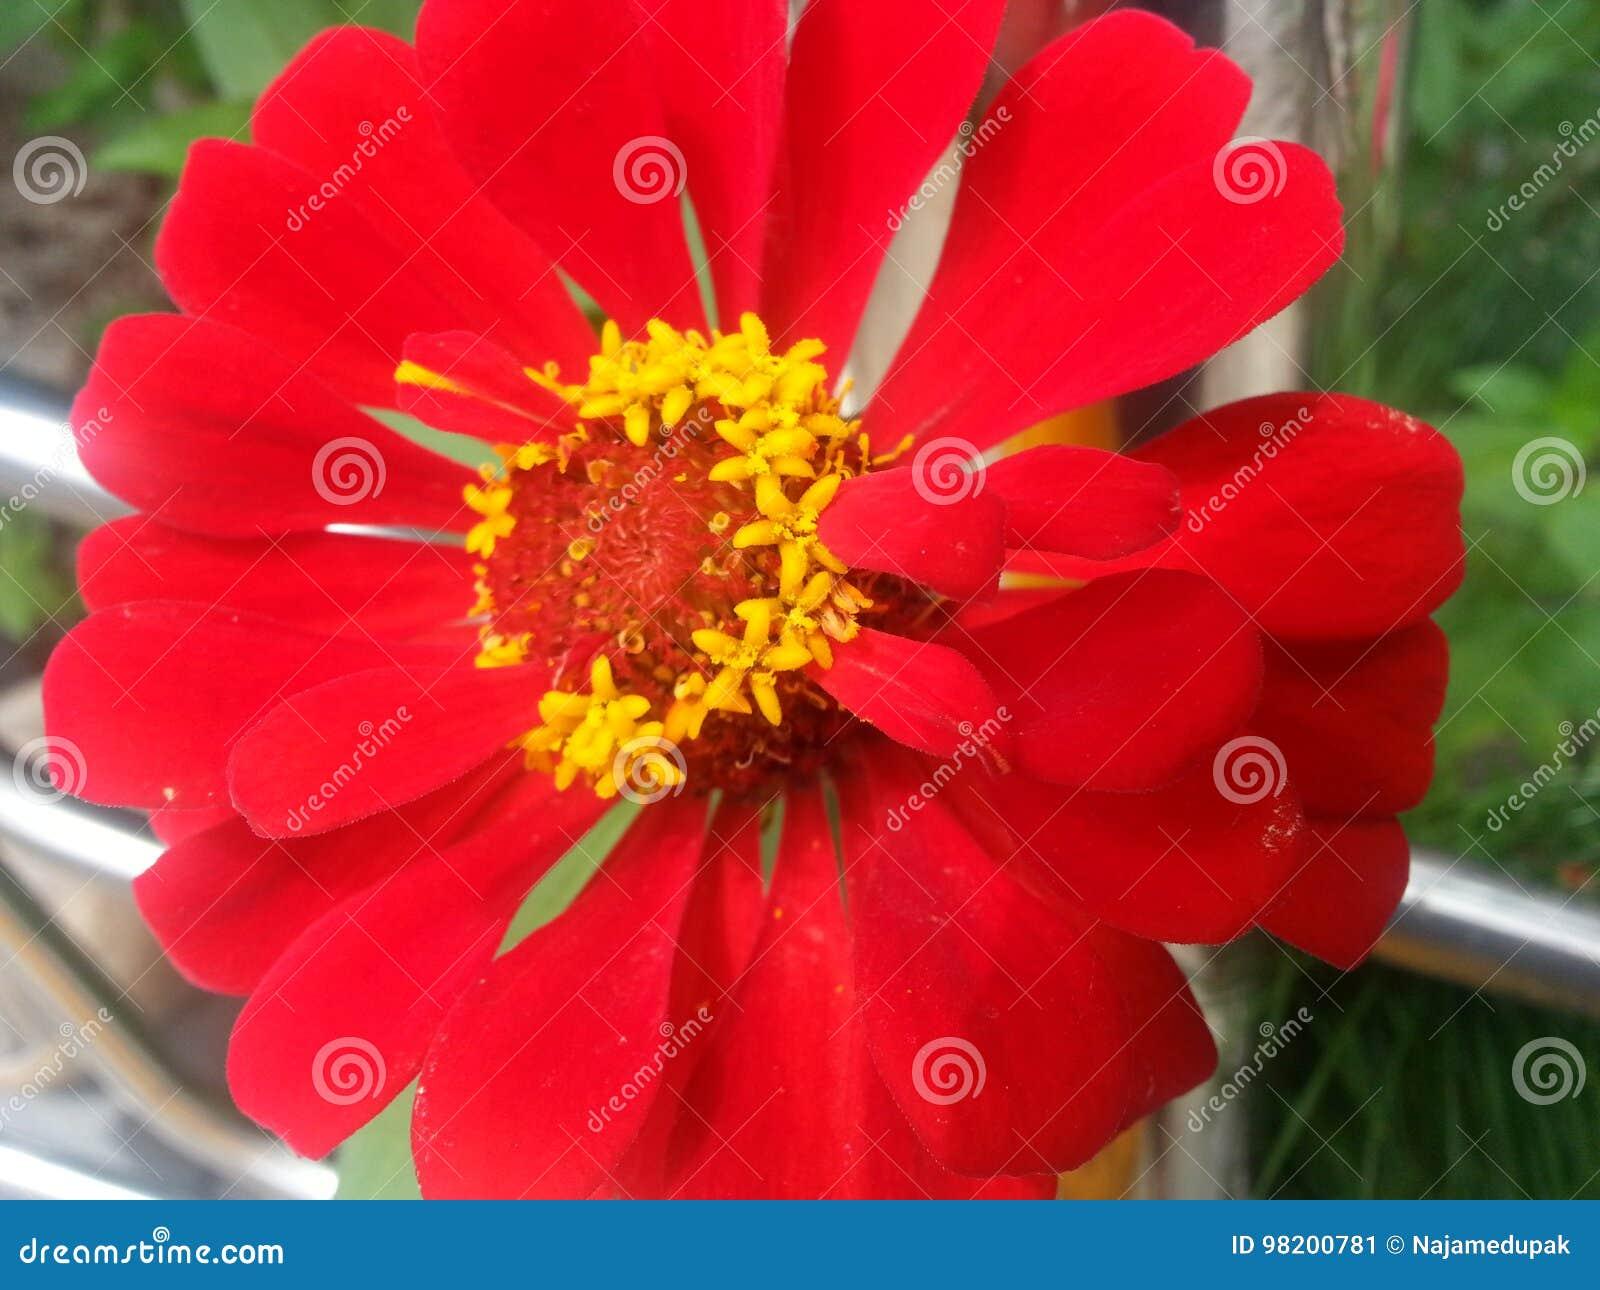 Shocking Red Flower Stock Image Image Of Beautiful Stamens 98200781